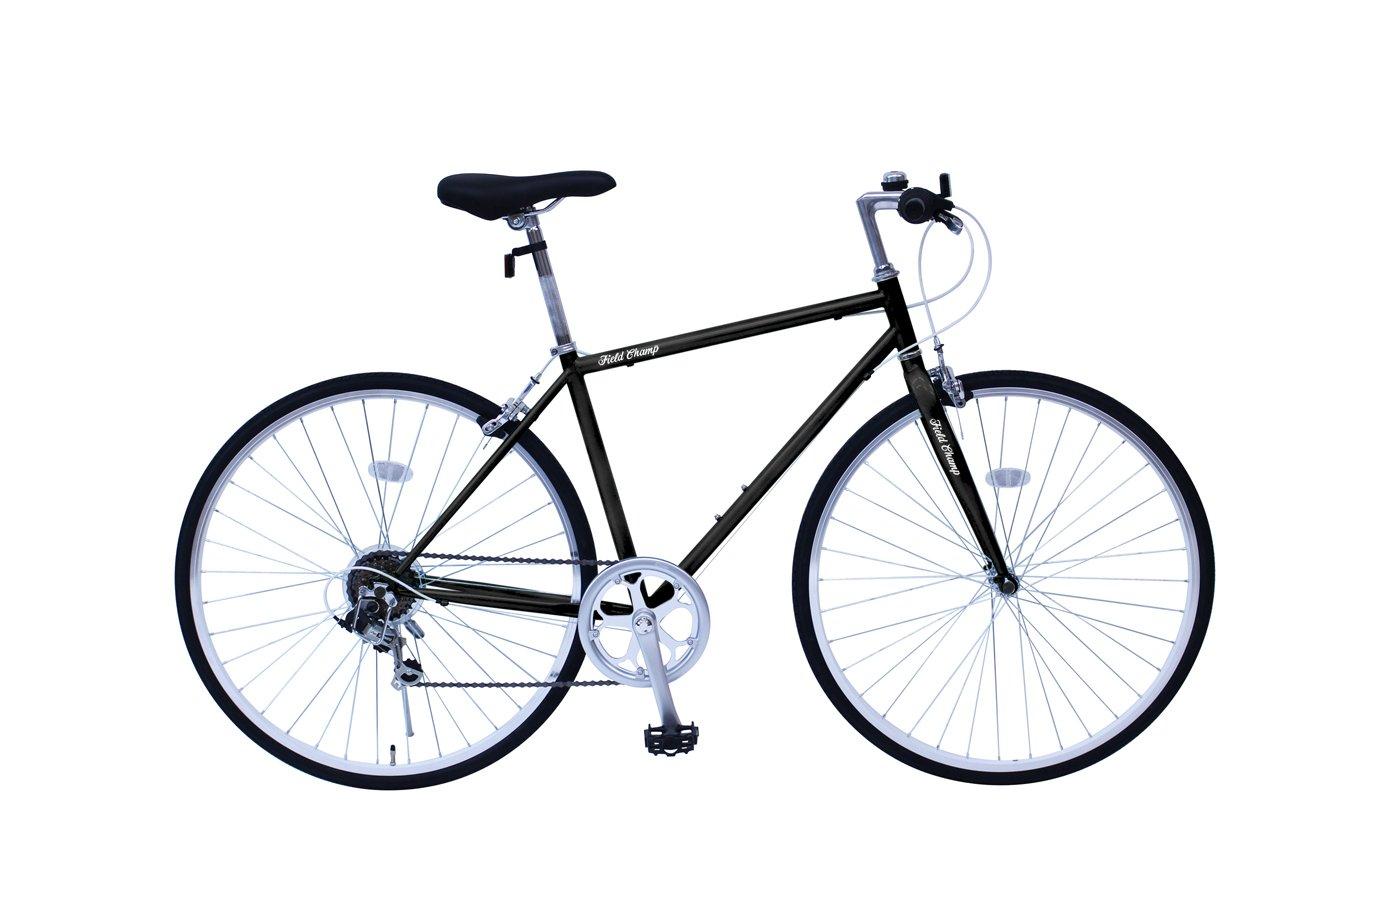 FIELD CHAMP MG-FCP700CF-BK ブラック [クロスバイク自転車] B0792M9DD4